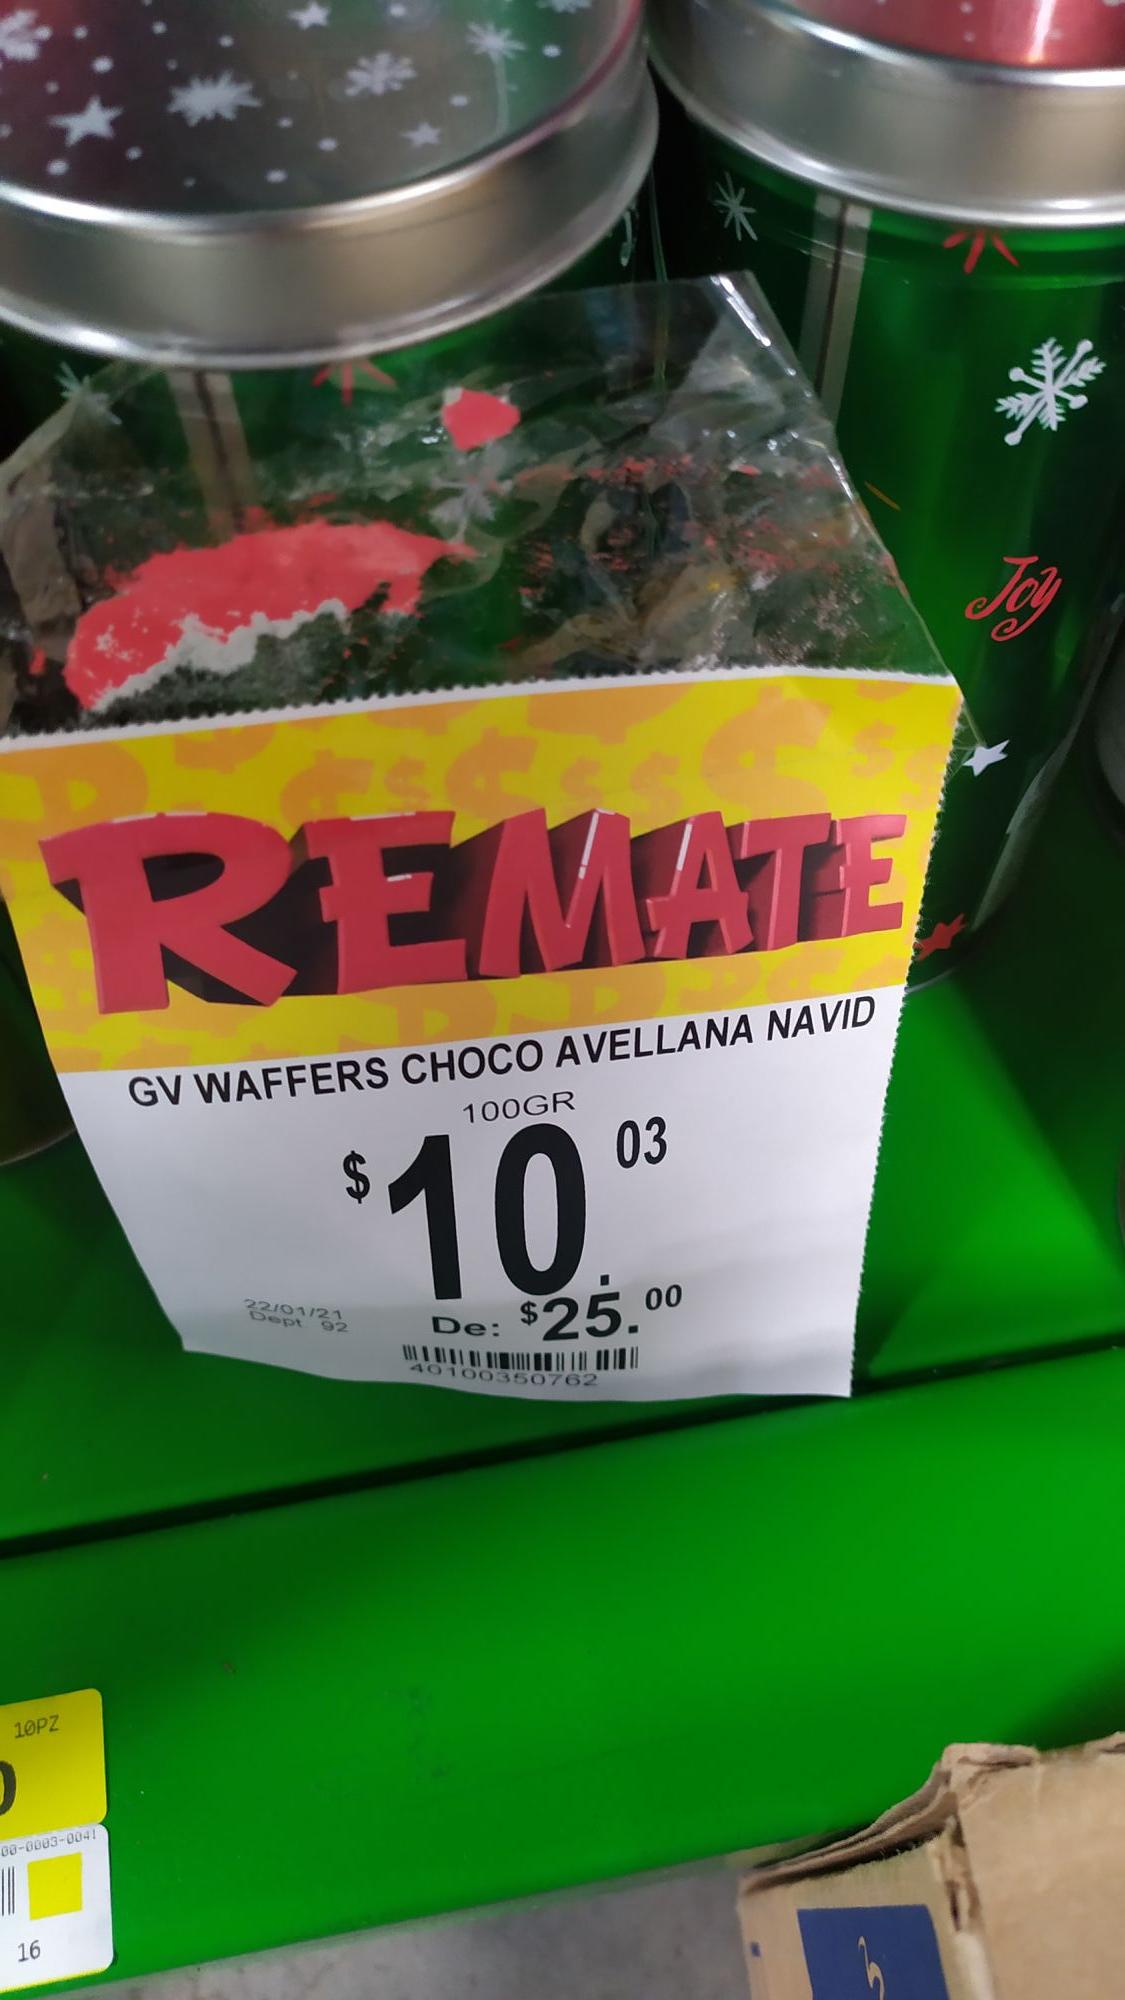 Bodega Aurrerá abastos Culiacán. Waffers sabor avellana de $25 a $10